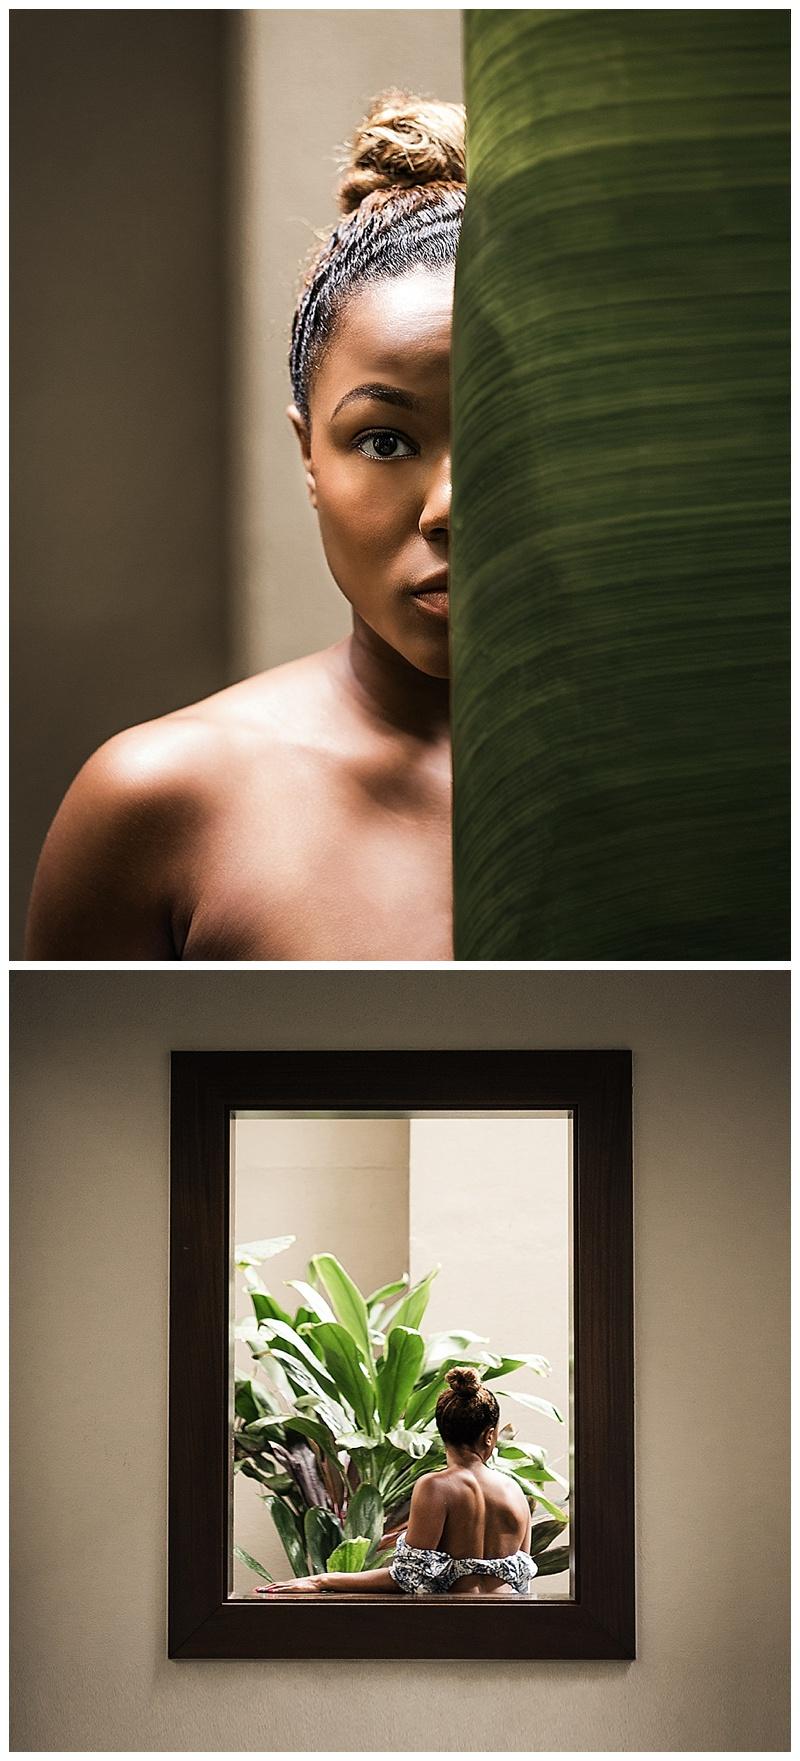 Hawaii-portrait-mini-session-African-American-woman-2